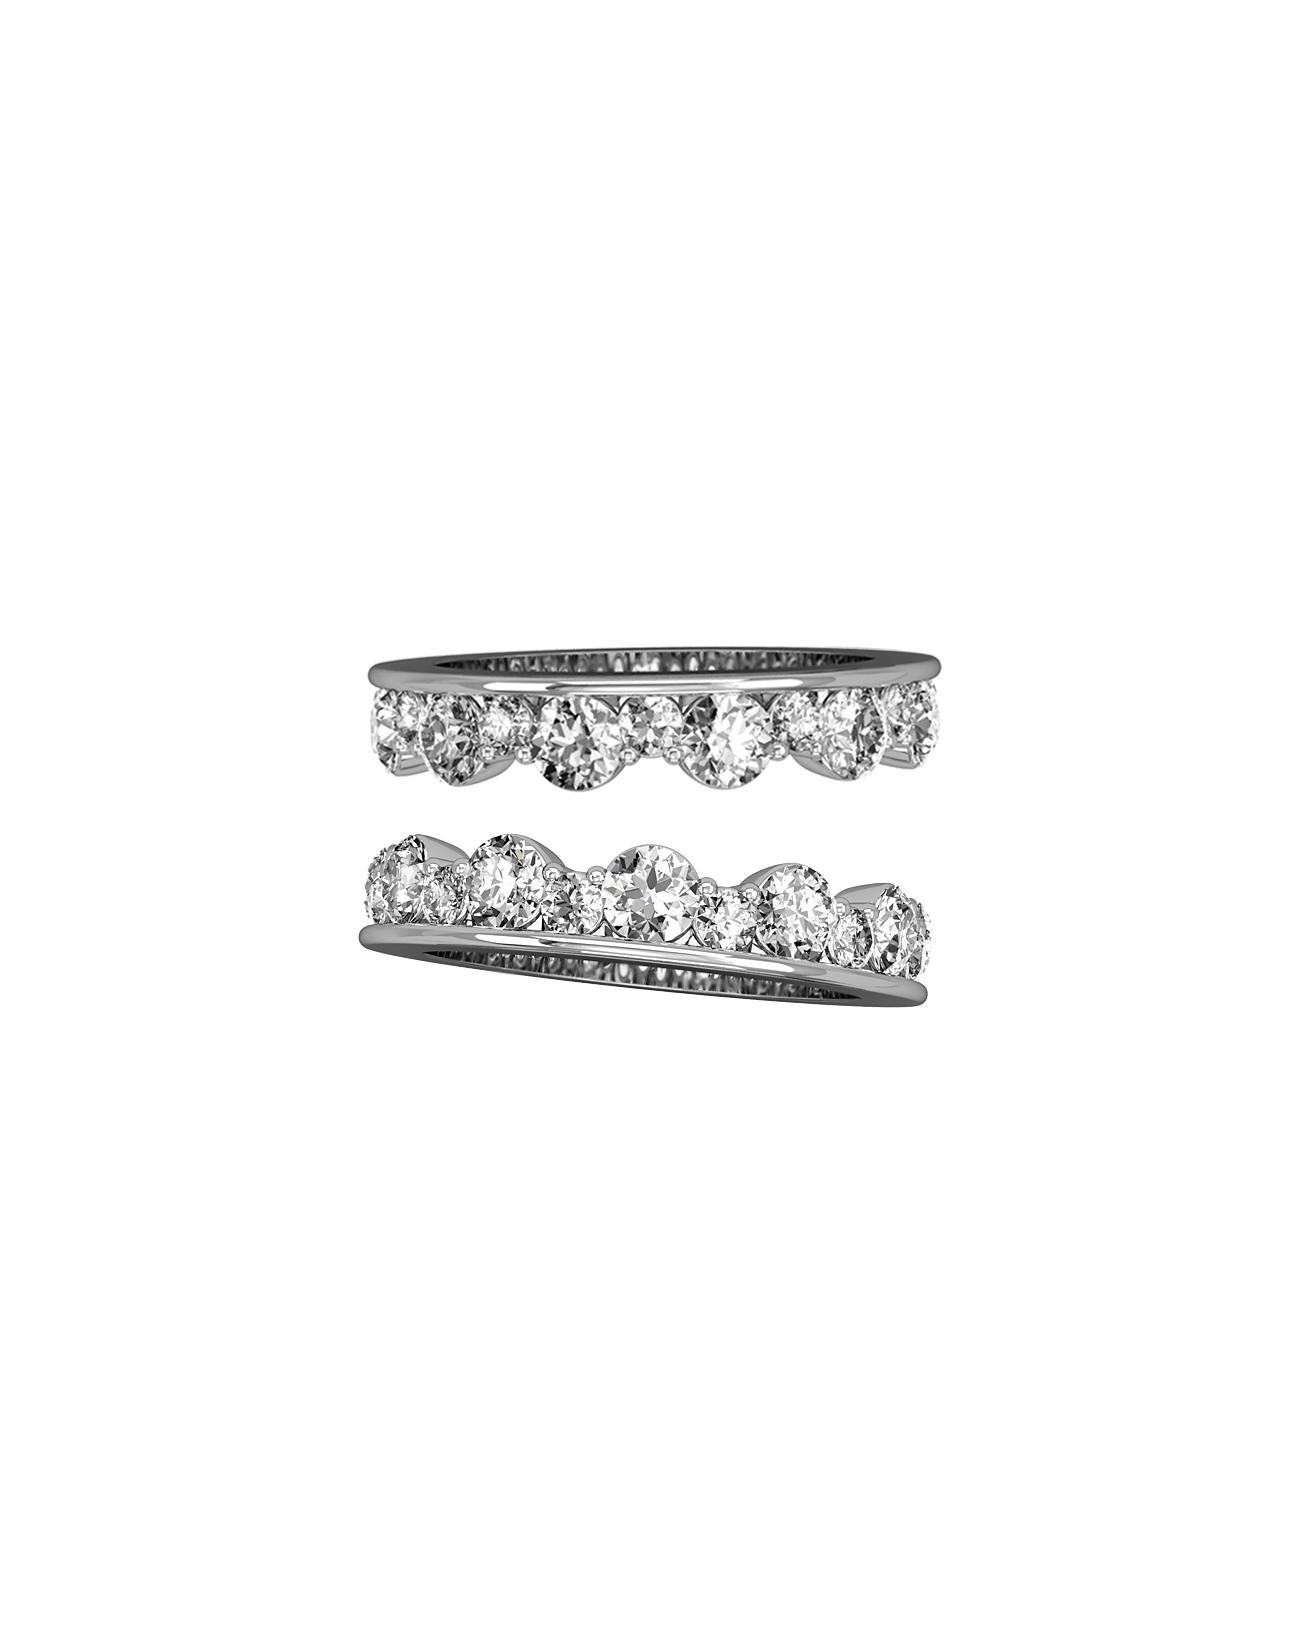 designer diamond bridal jewelry-2-4.jpg